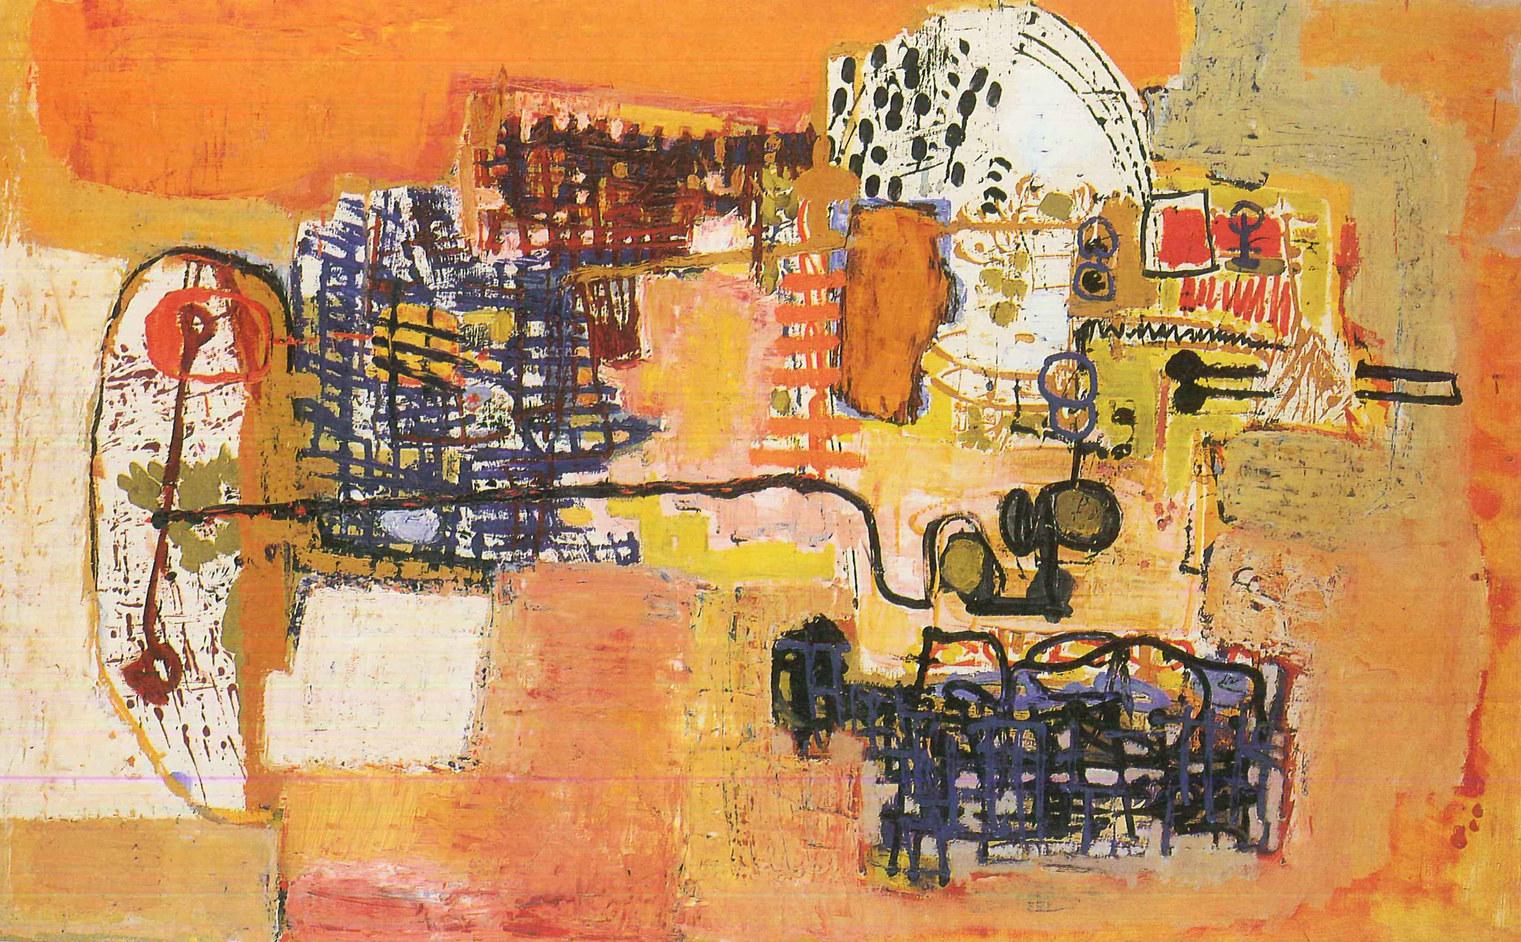 Lea Nikel, Untitled, 1955, b85.0230.jpg